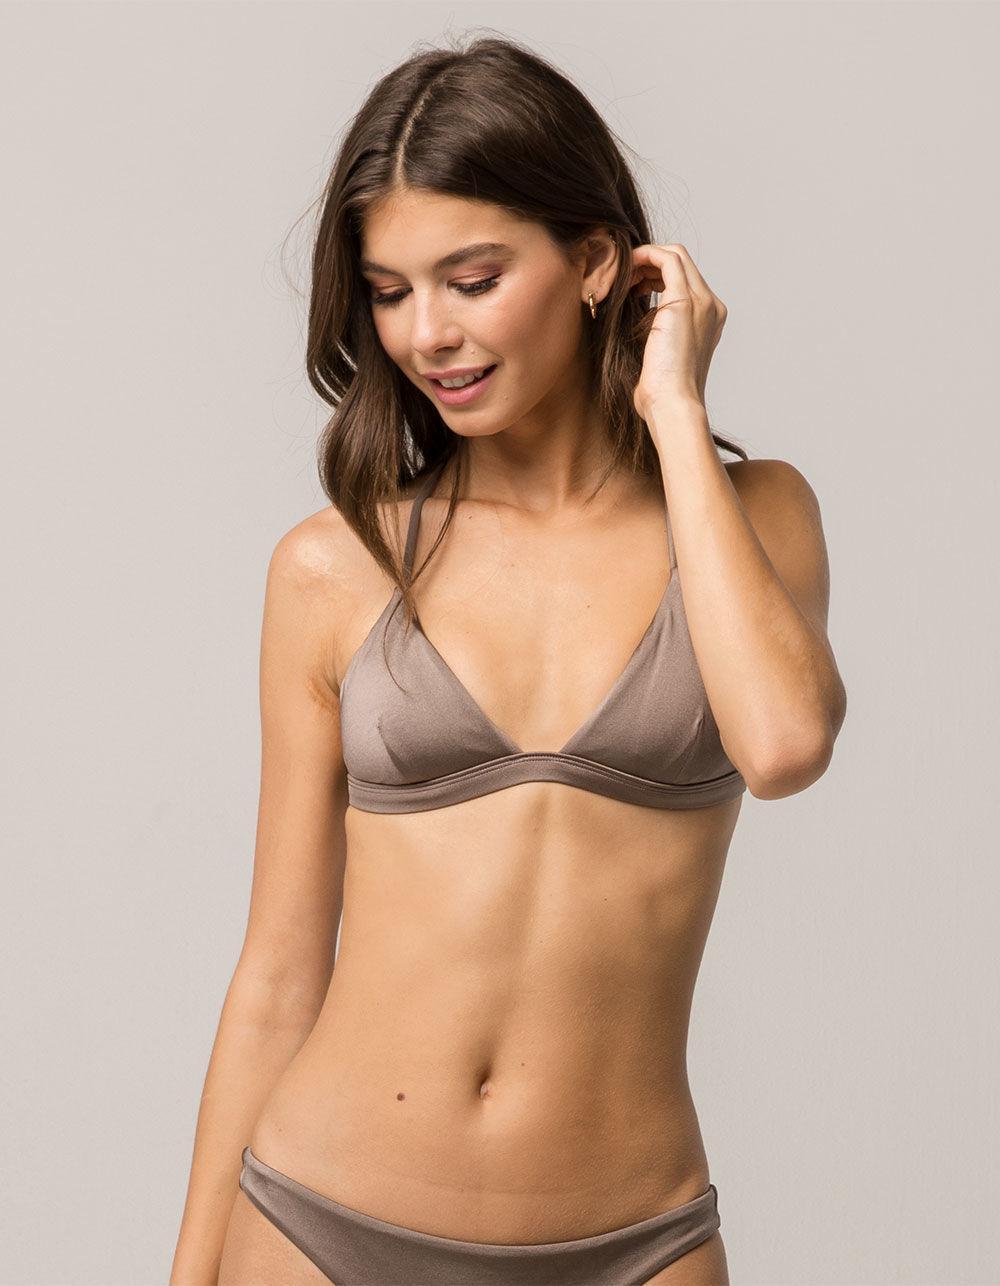 c1cb22e157ff2 Lyst - Billabong Sol Searcher Bronze Bikini Top in Brown